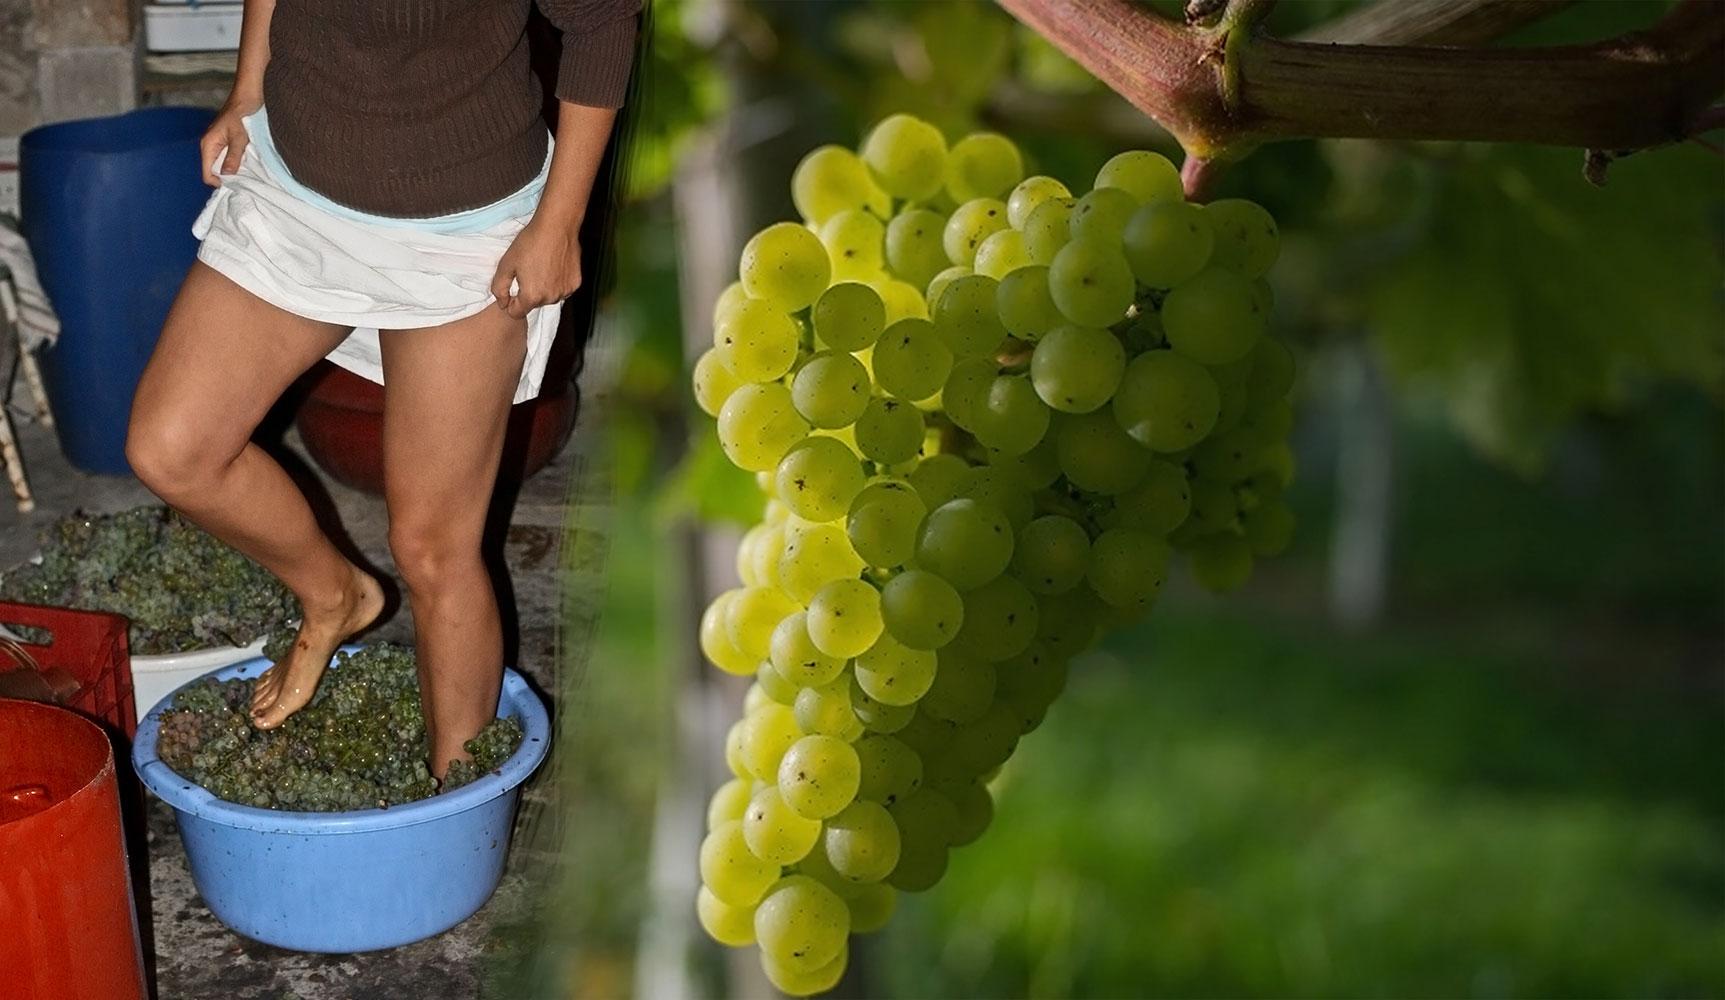 vendemmia uva bianca e pigiatura